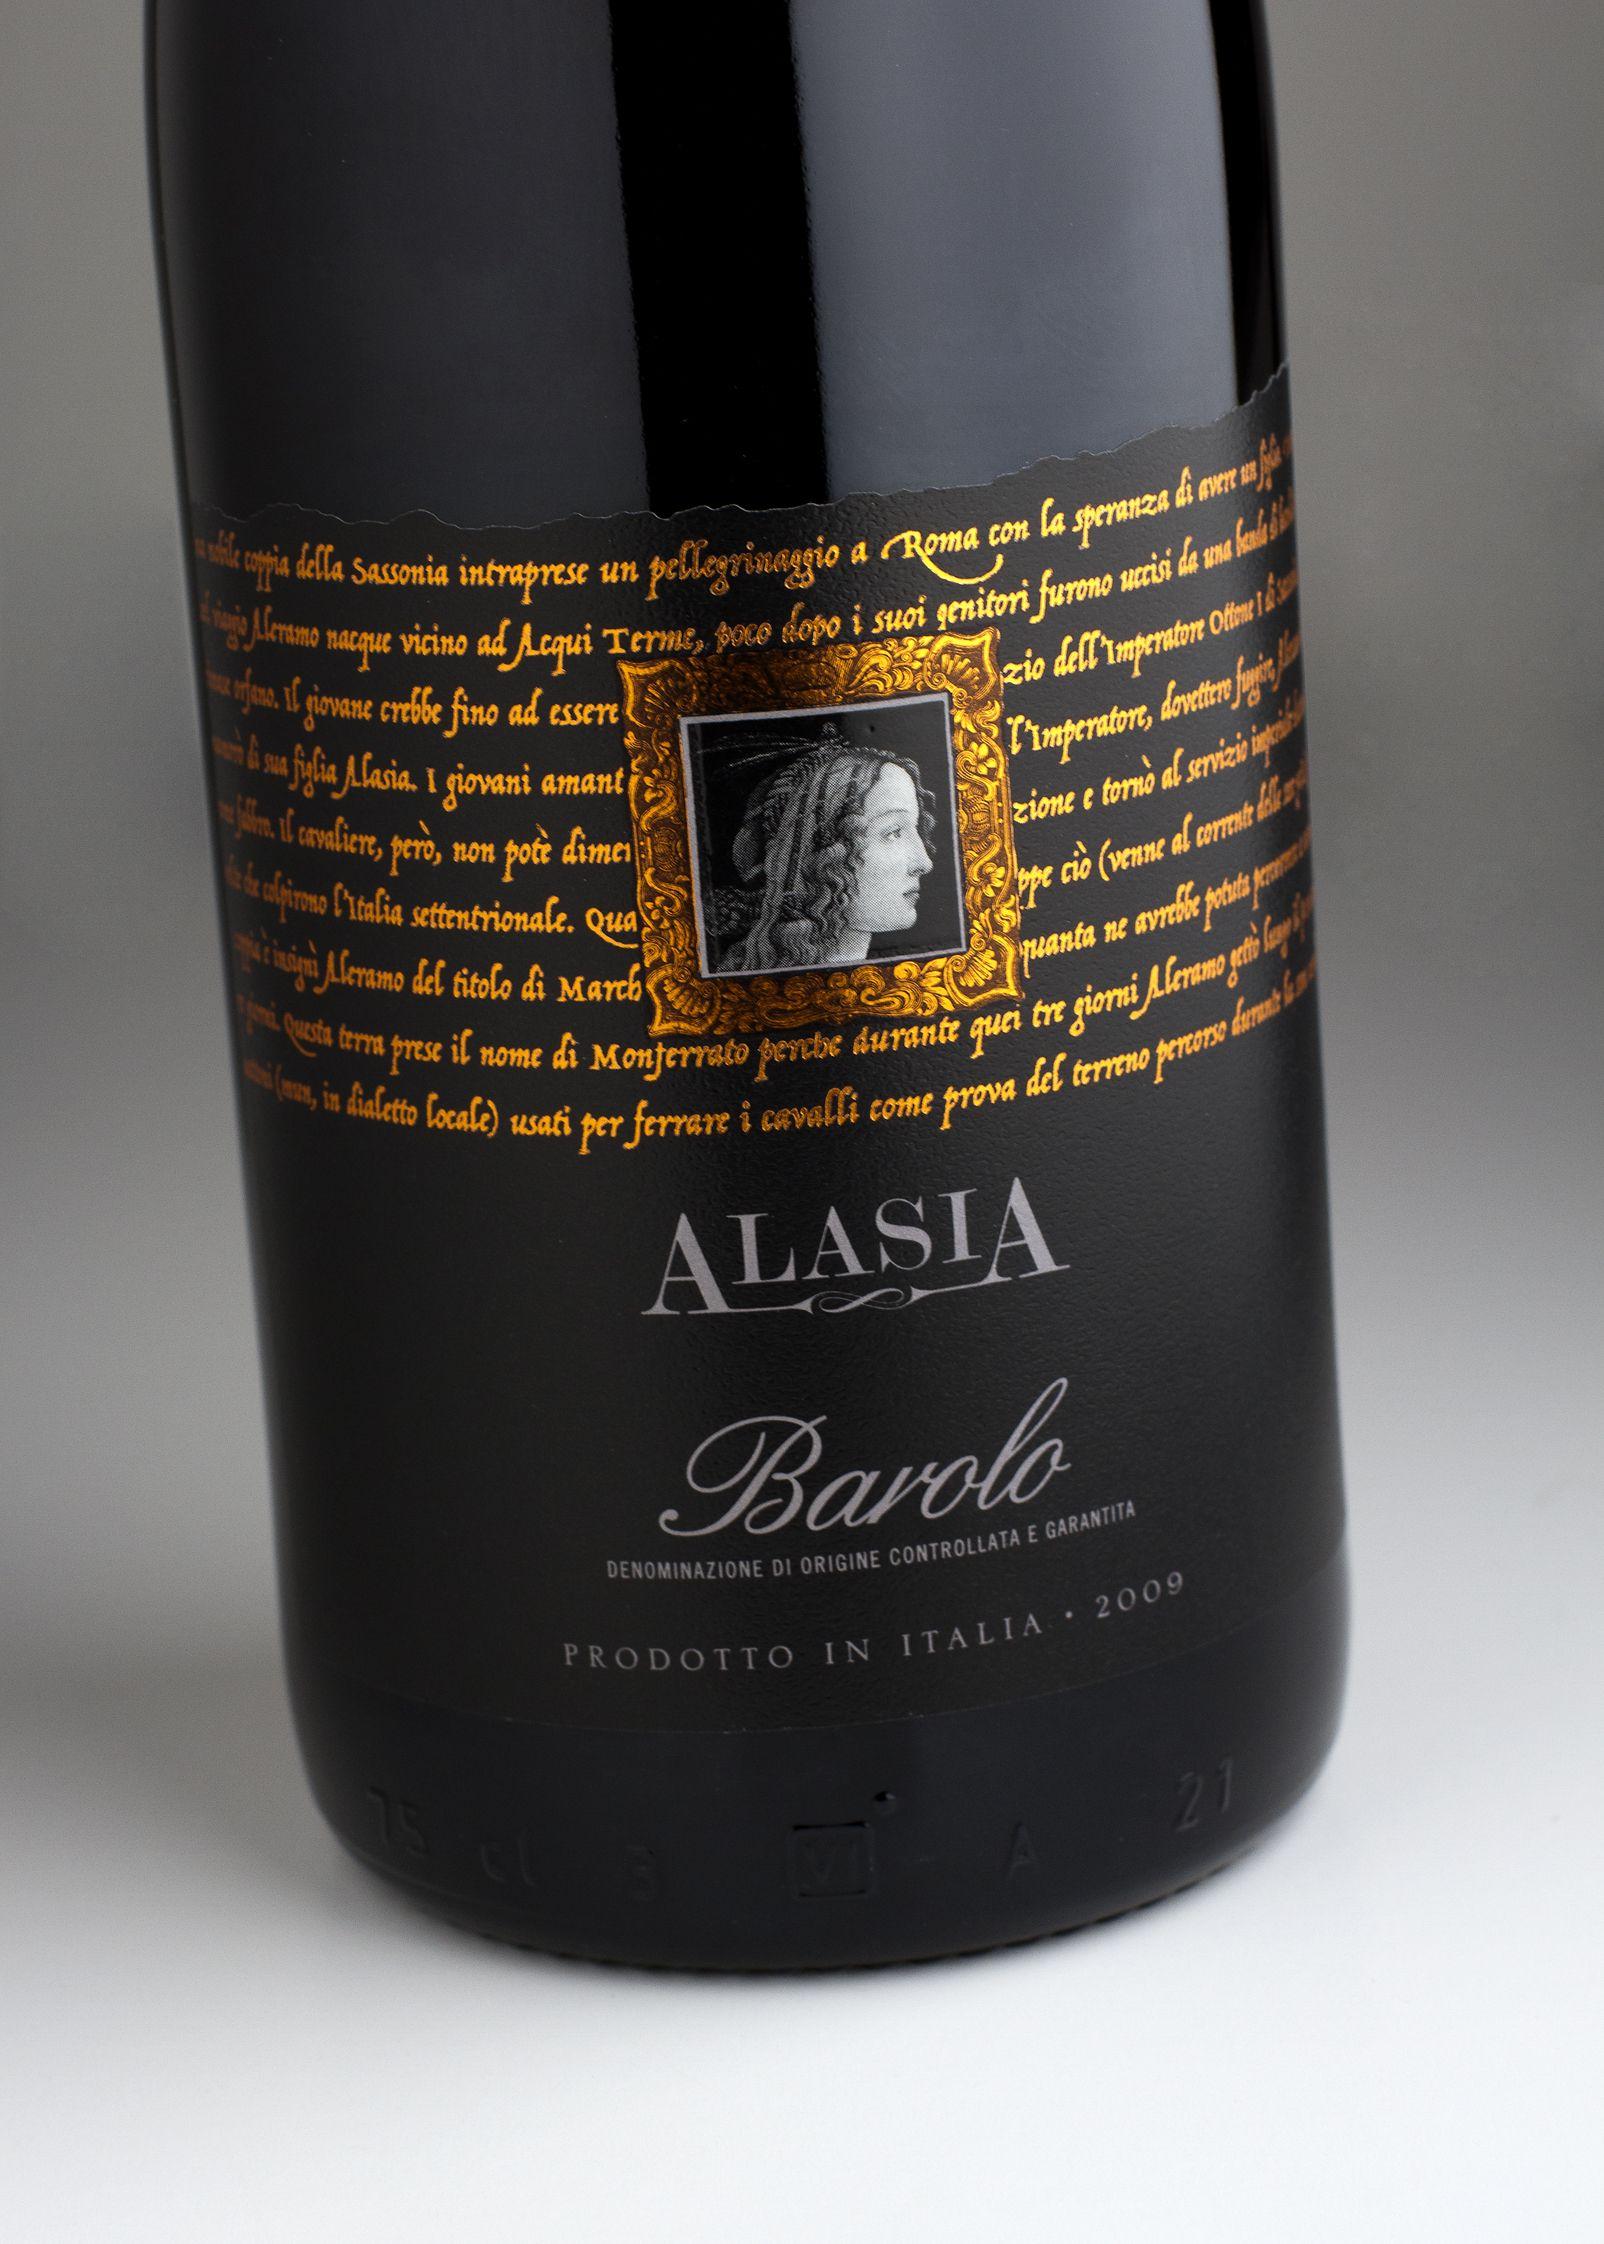 Alasia Barolo – premium end of a three tier range of Italian wines – Harpers Global Design Awards 2015 Bronze Medal